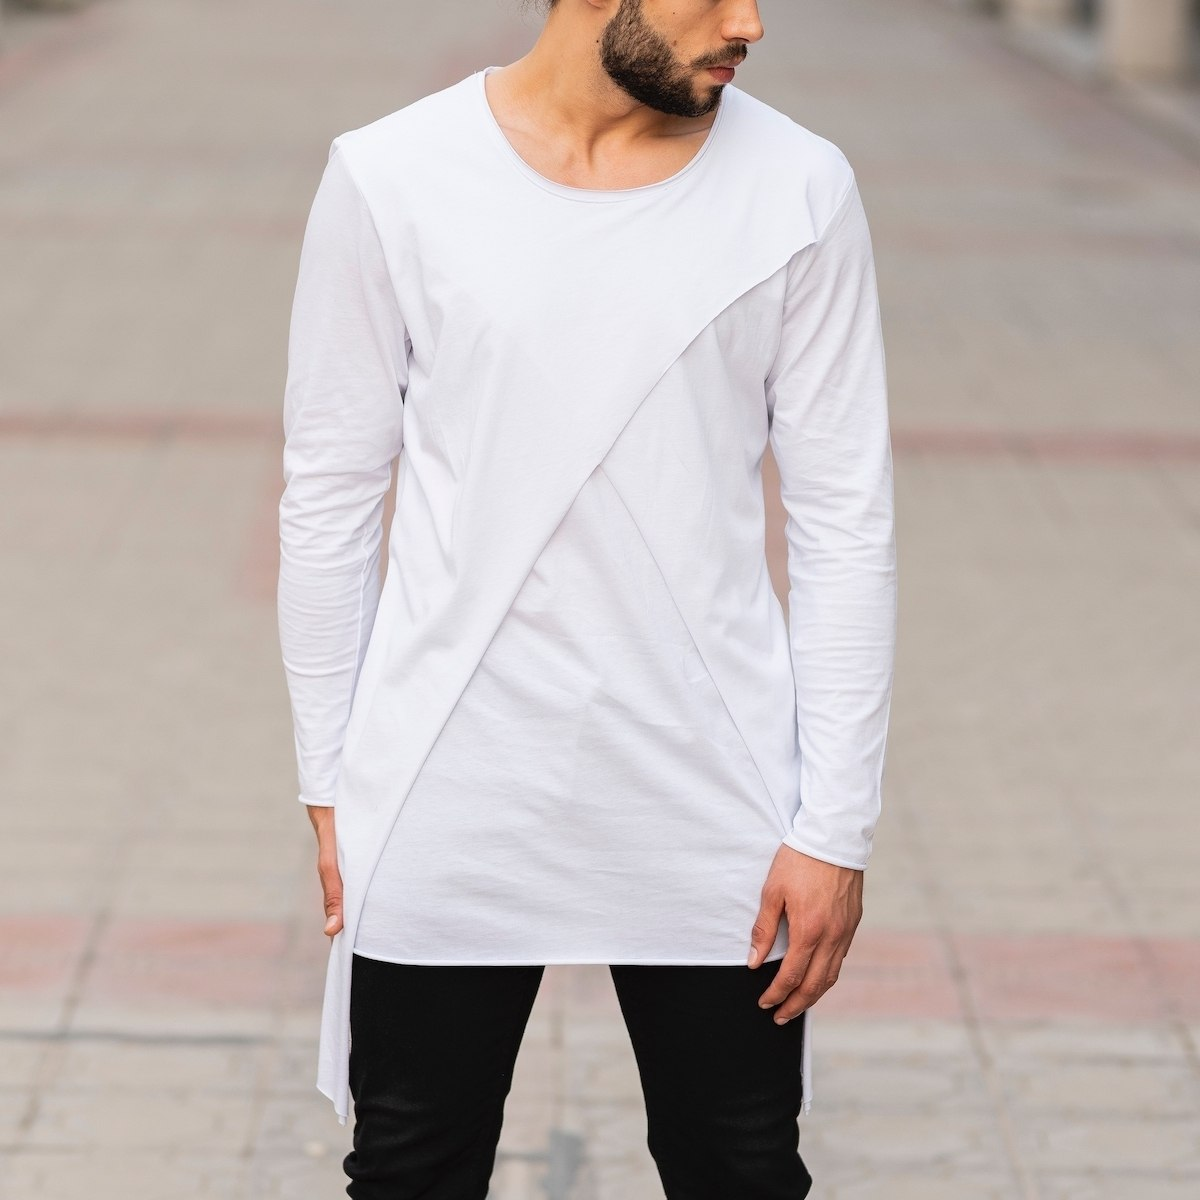 Double Textured Sweatshirt In White Mv Premium Brand - 1